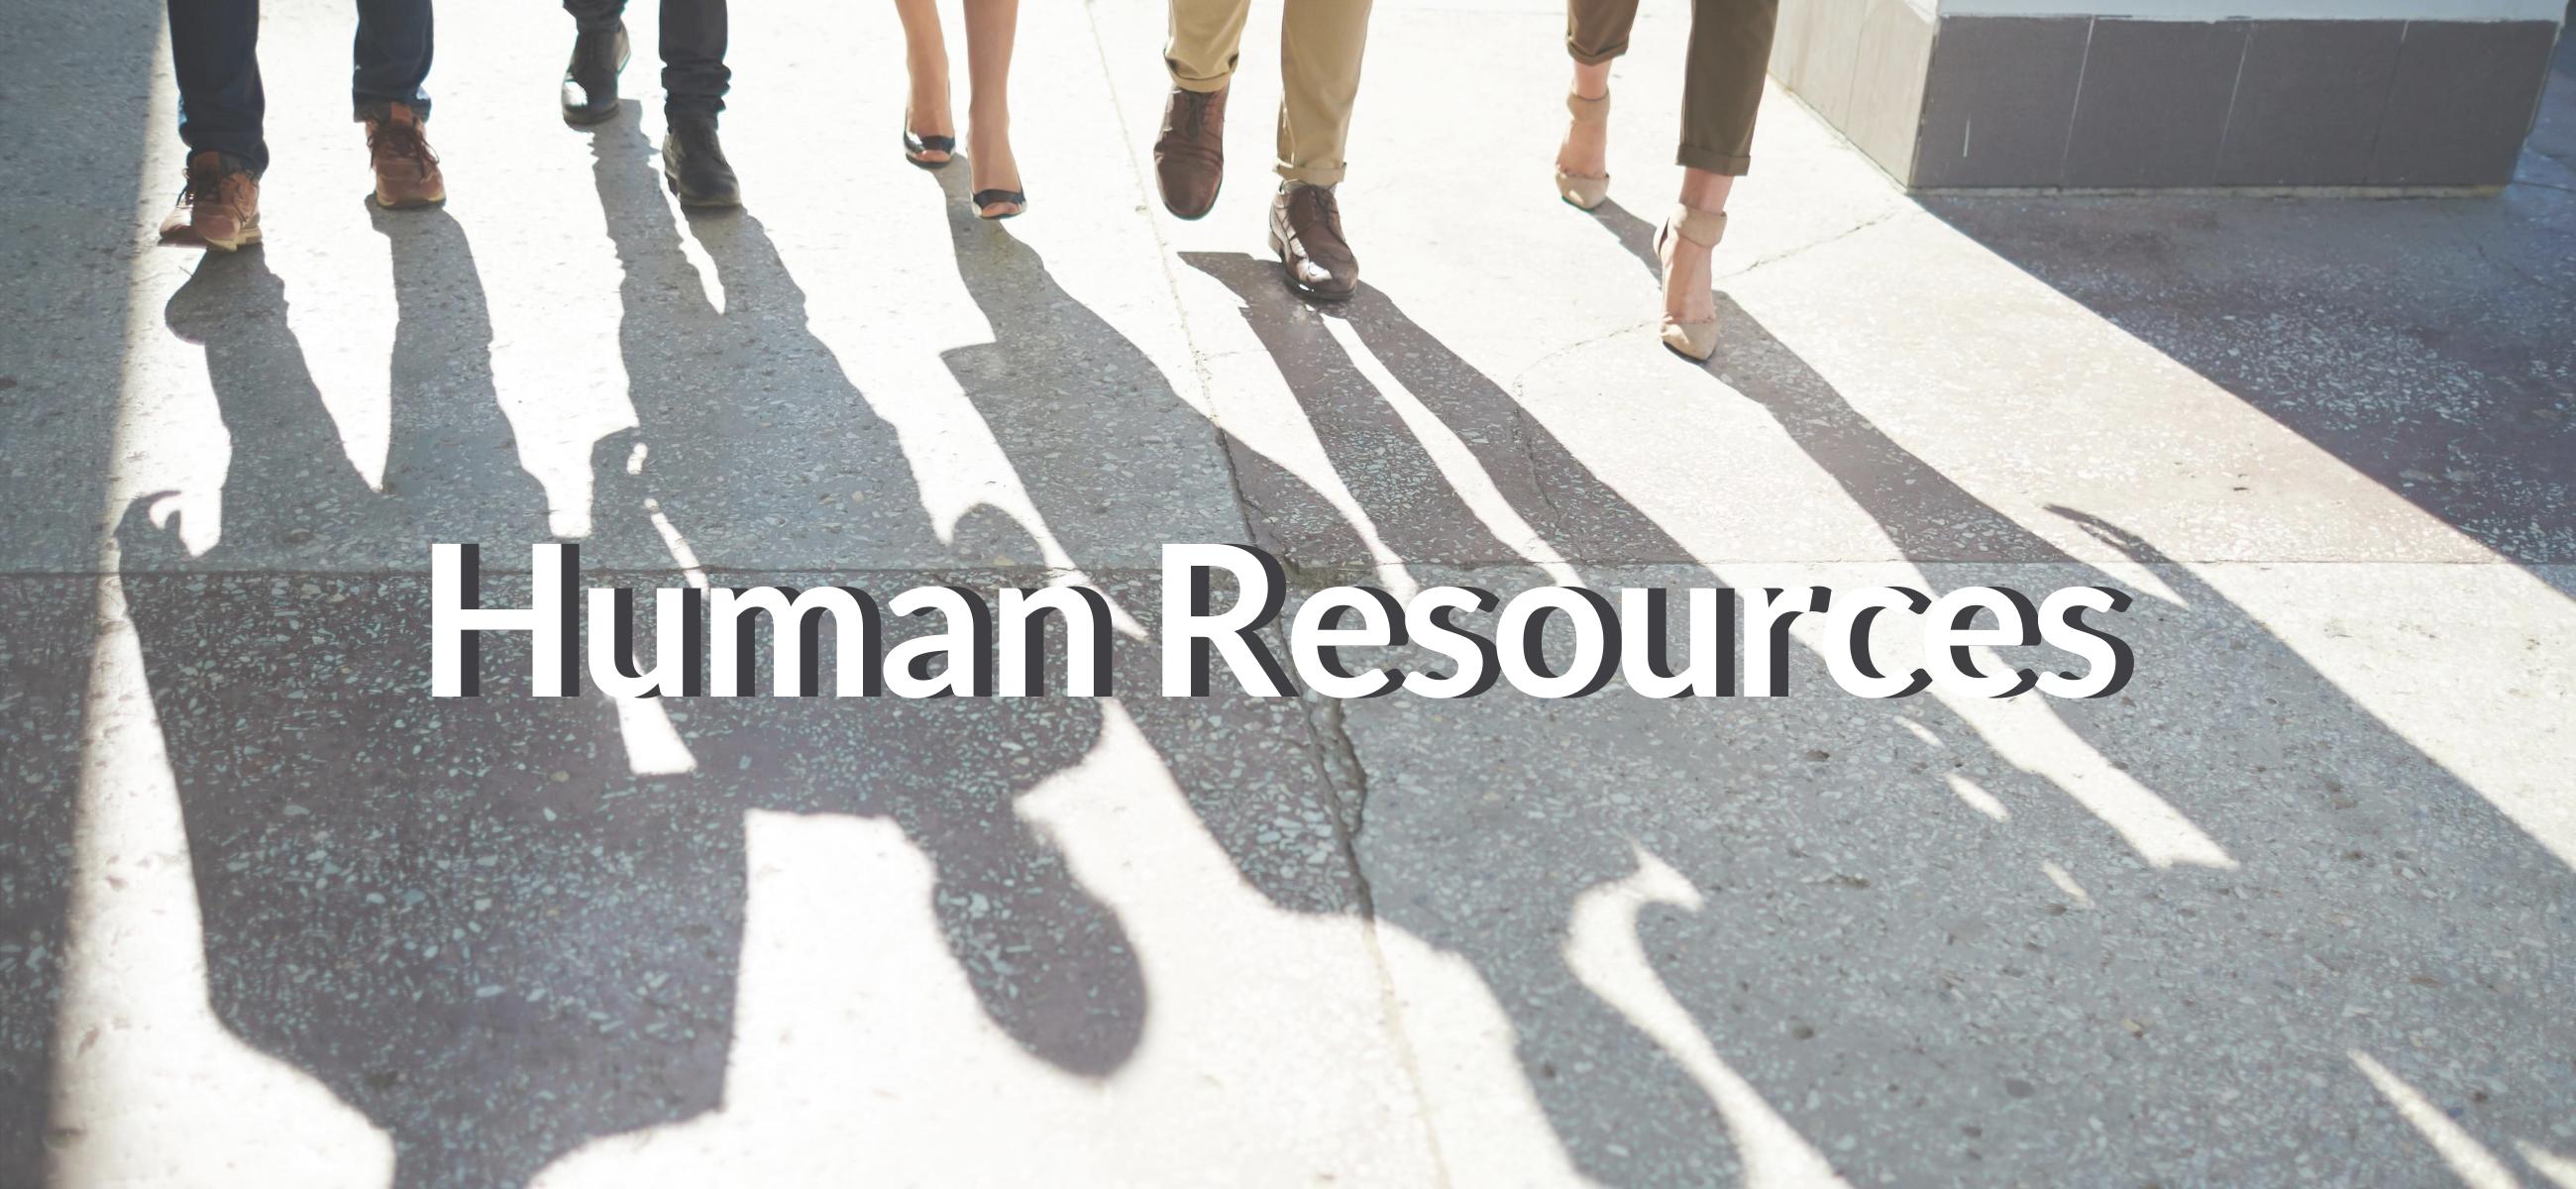 Human Resources (1)